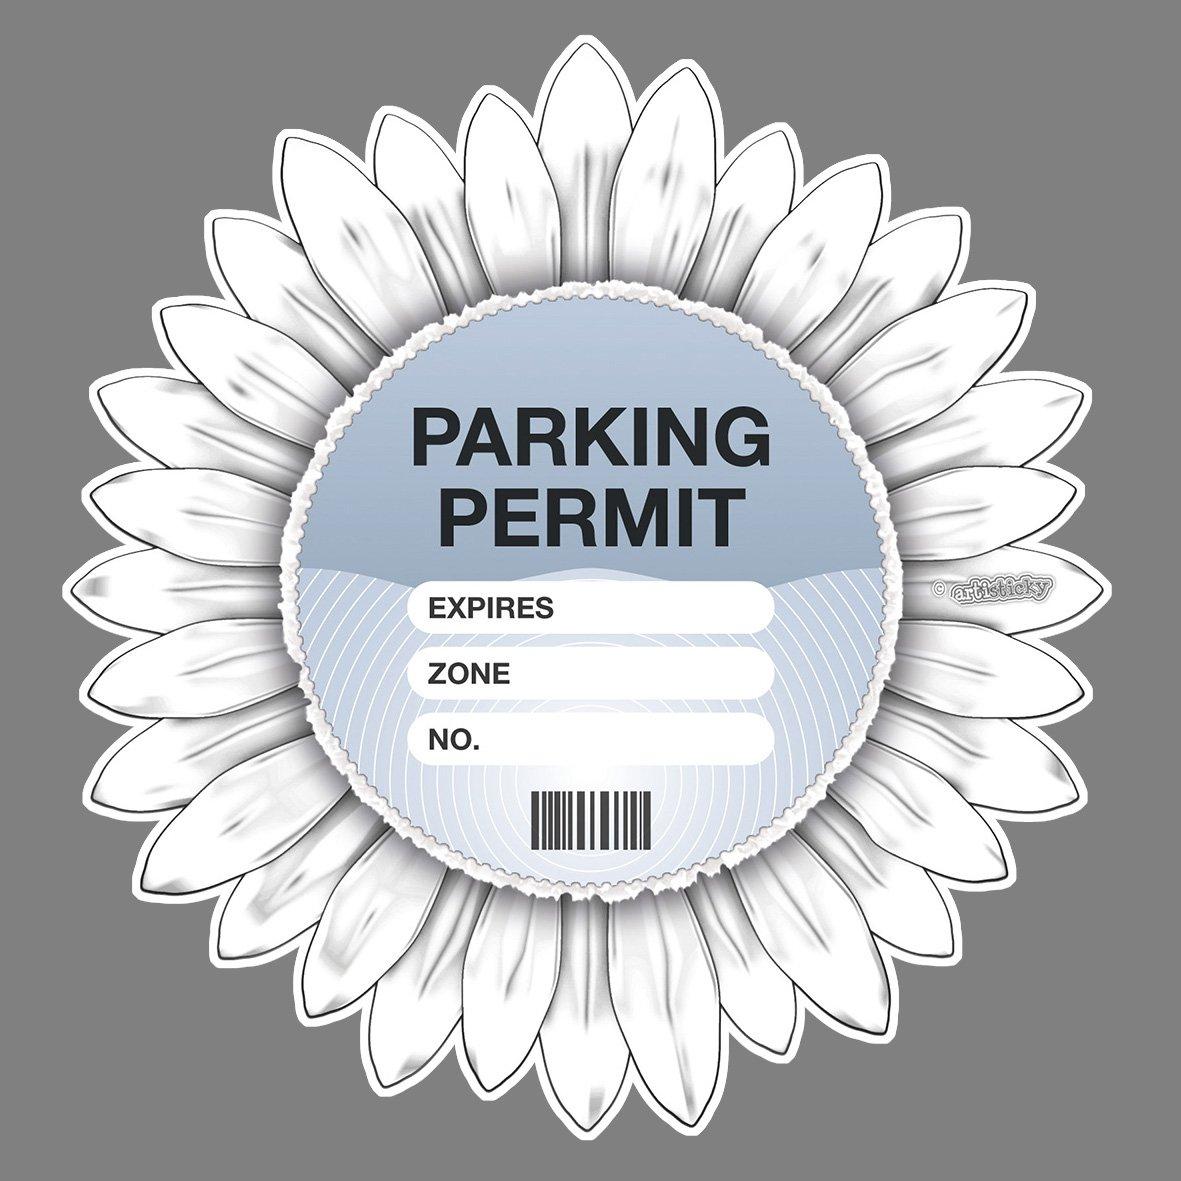 Parking Permit Holder Skin WHITE Flower Gerbera - Free Postage Artisticky AS-0056